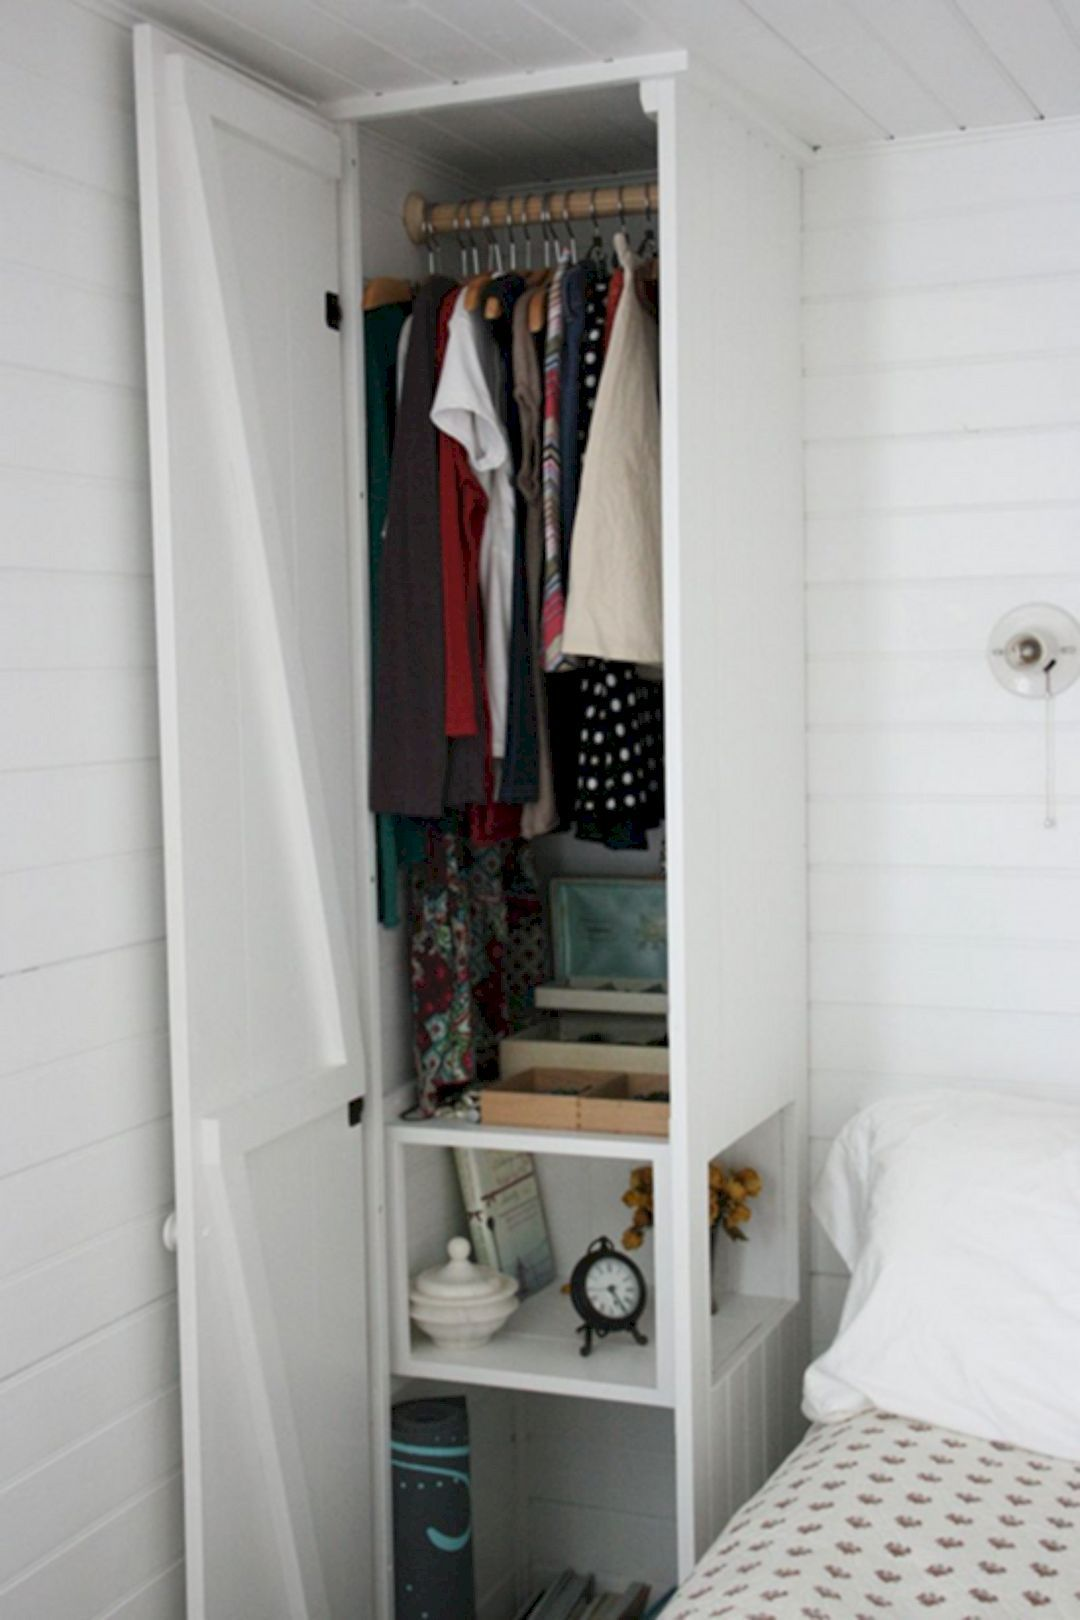 5 Stunning Bedroom Storage Ideas Diy Bedroom Storage Small Bedroom Storage Small Space Bedroom